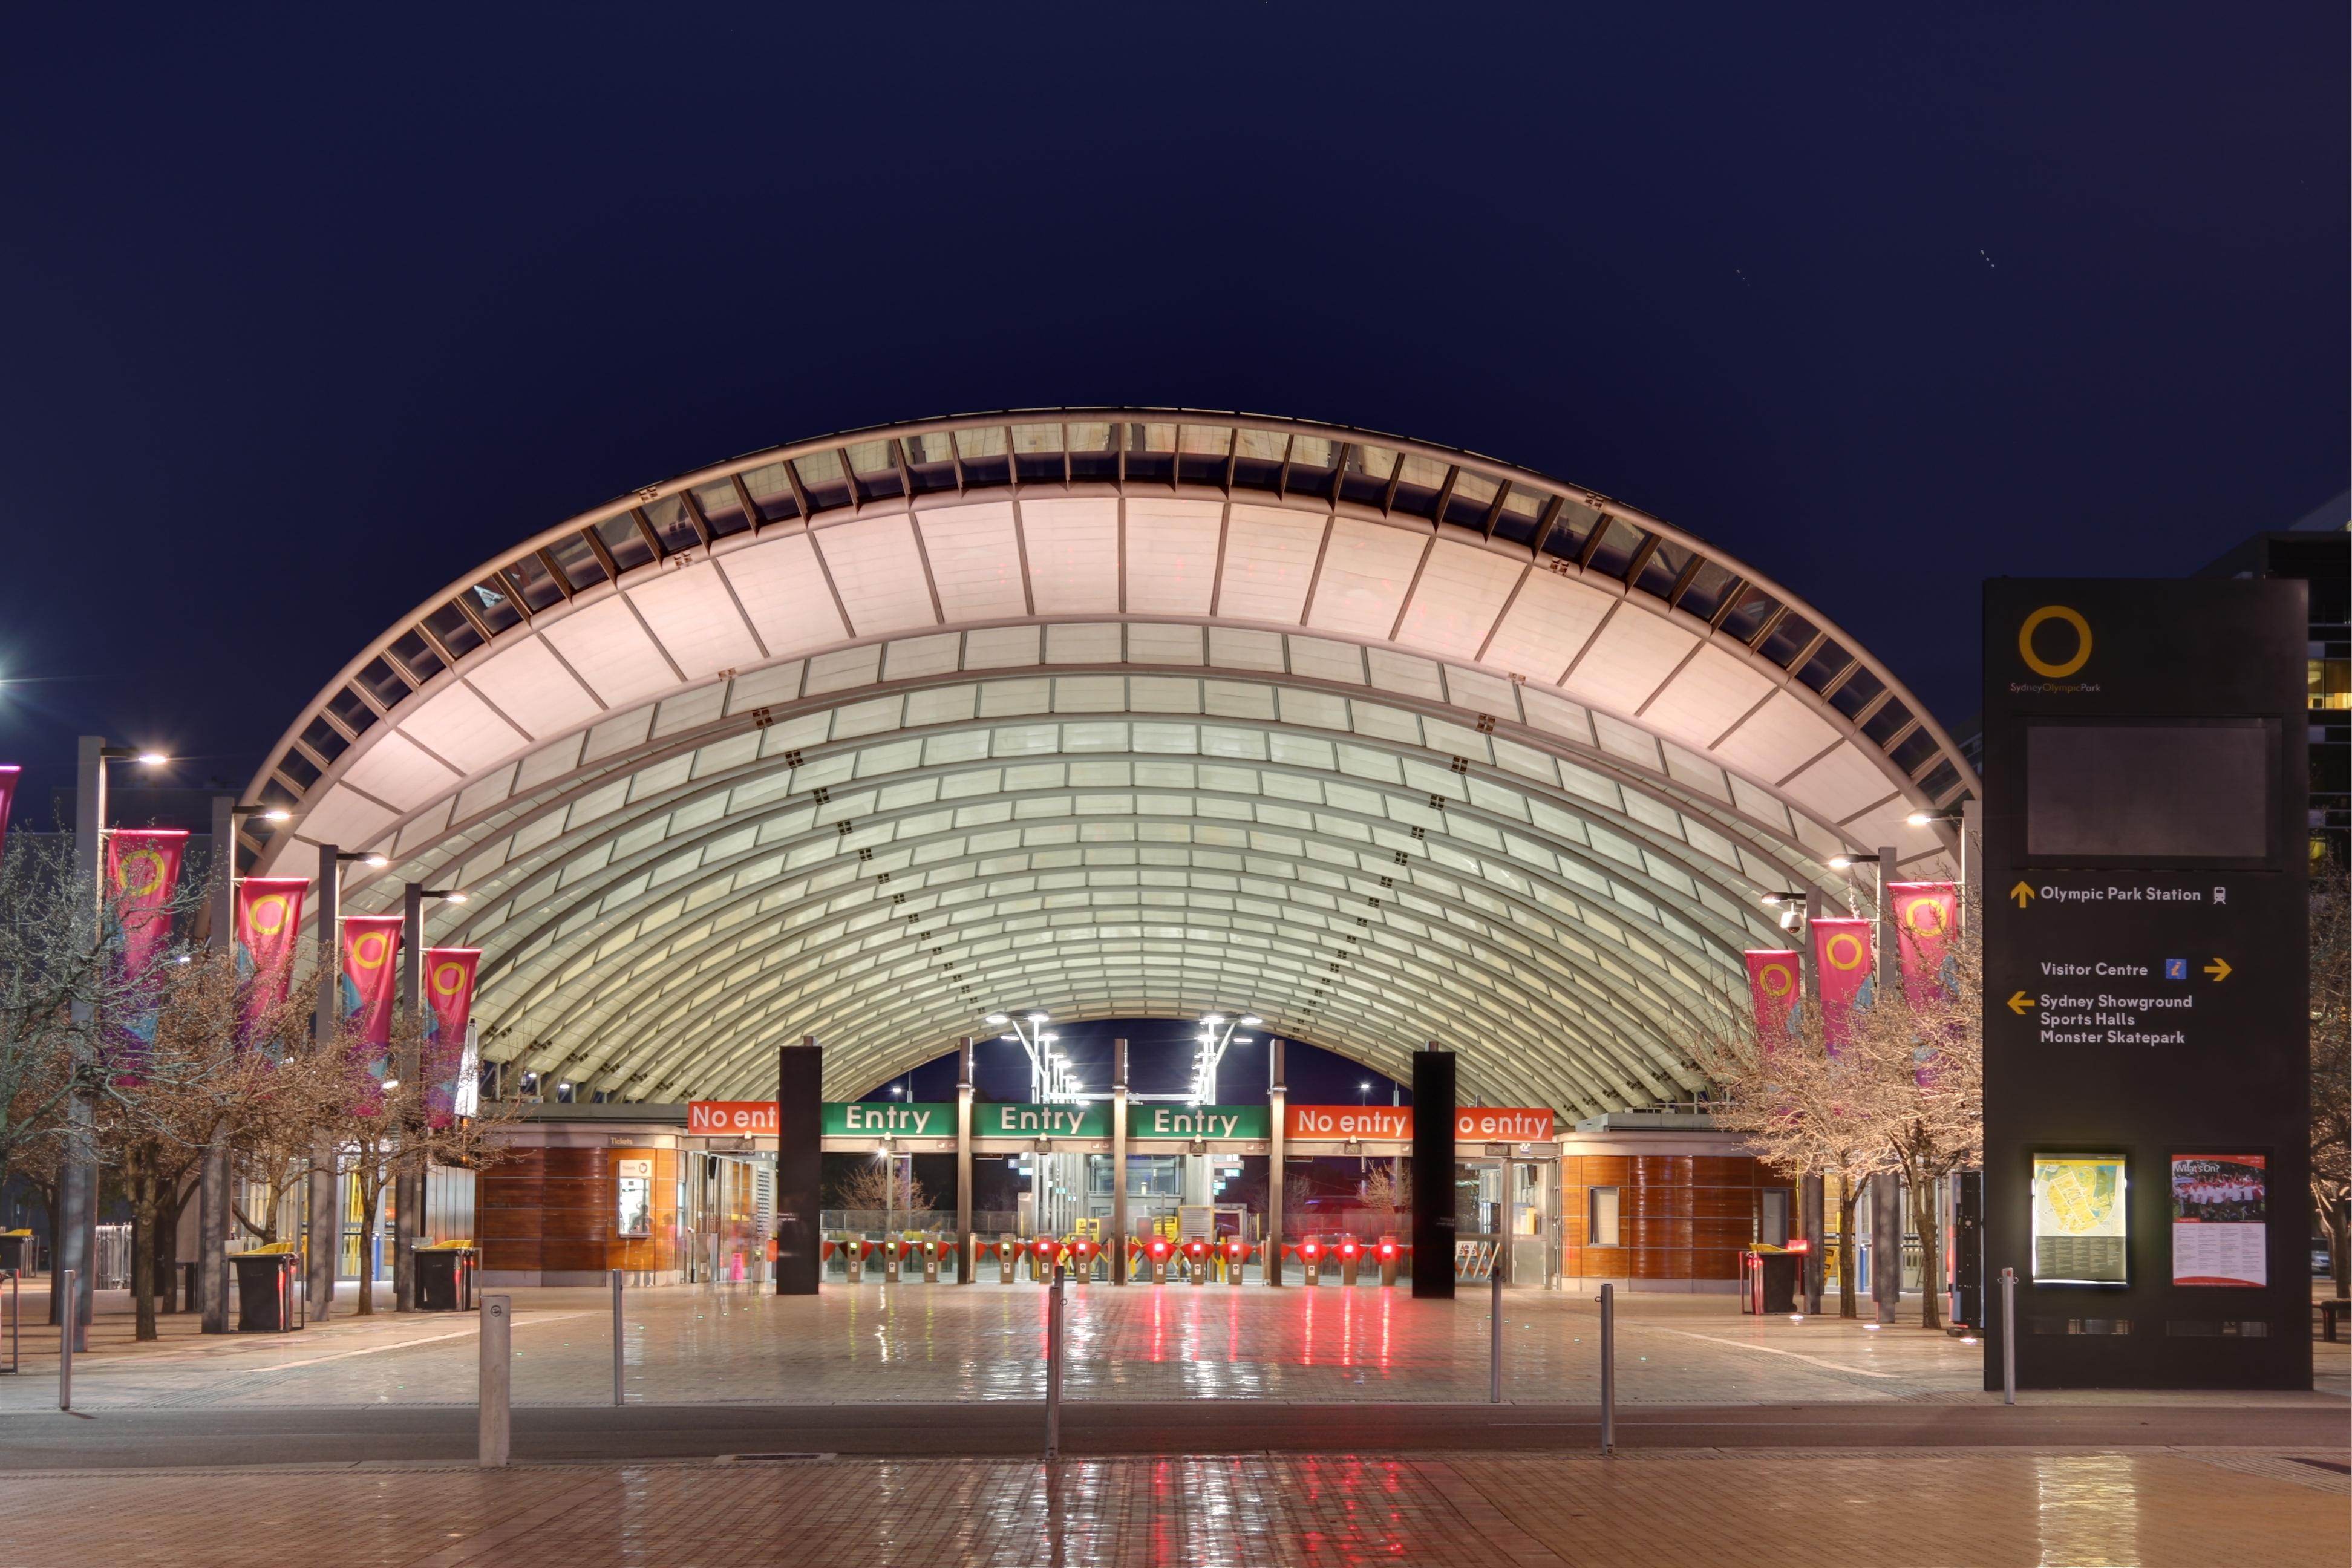 FileOlympic Park Train Station Syd